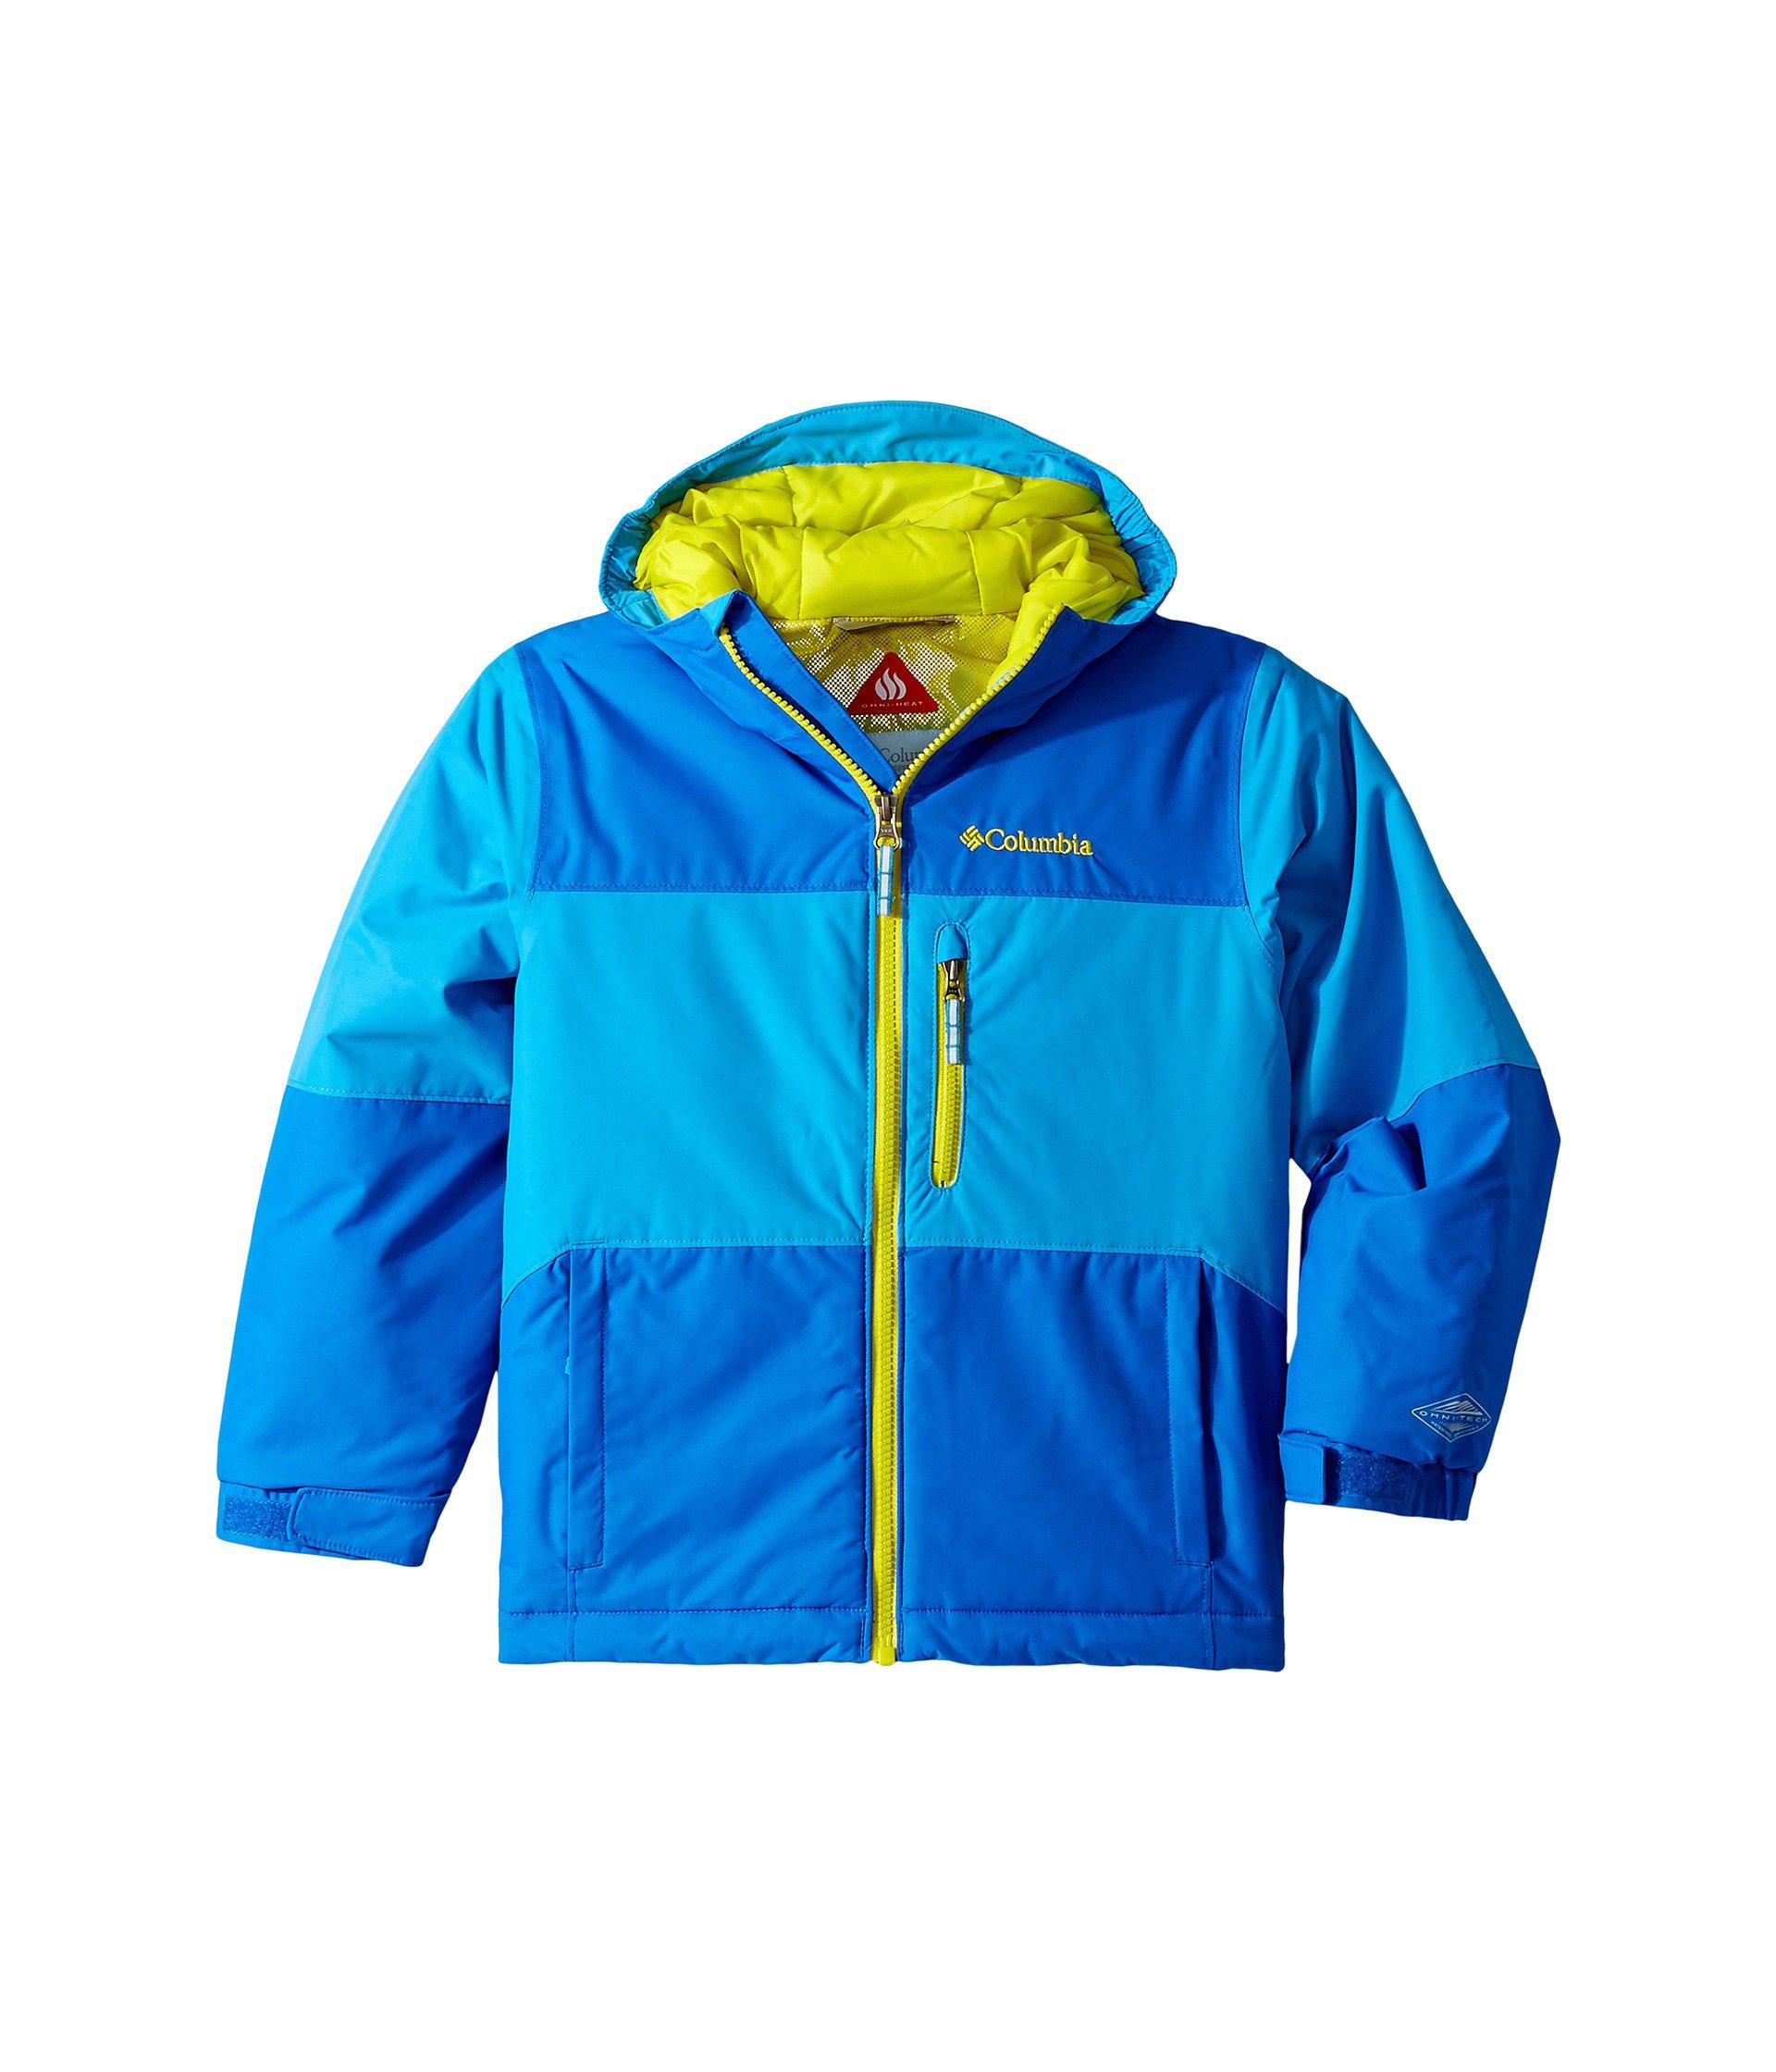 Columbia Kids Boy's Magic Mile Jacket (Little Kids/Big Kids) Peninsula Super Blue/Ginkgo Large